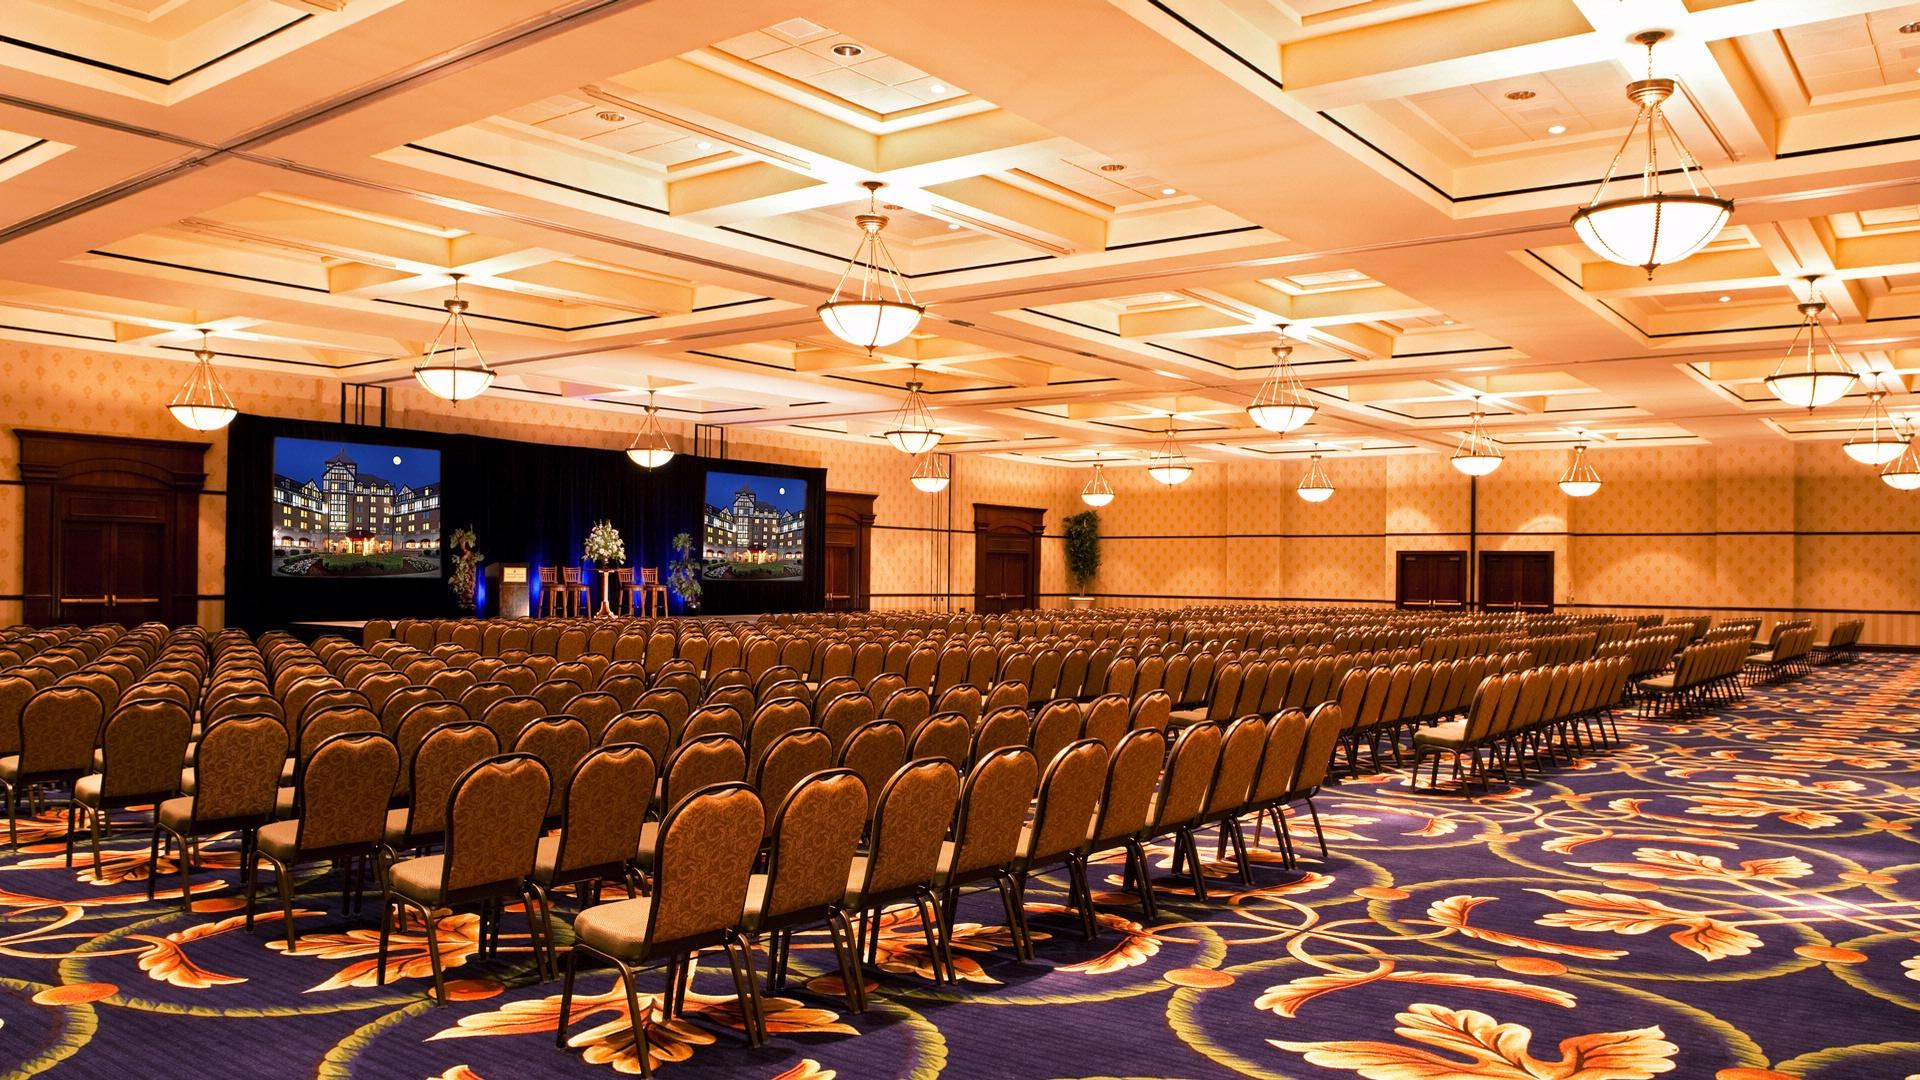 Blue Ridge Conference Center Hotel Roanoke VA